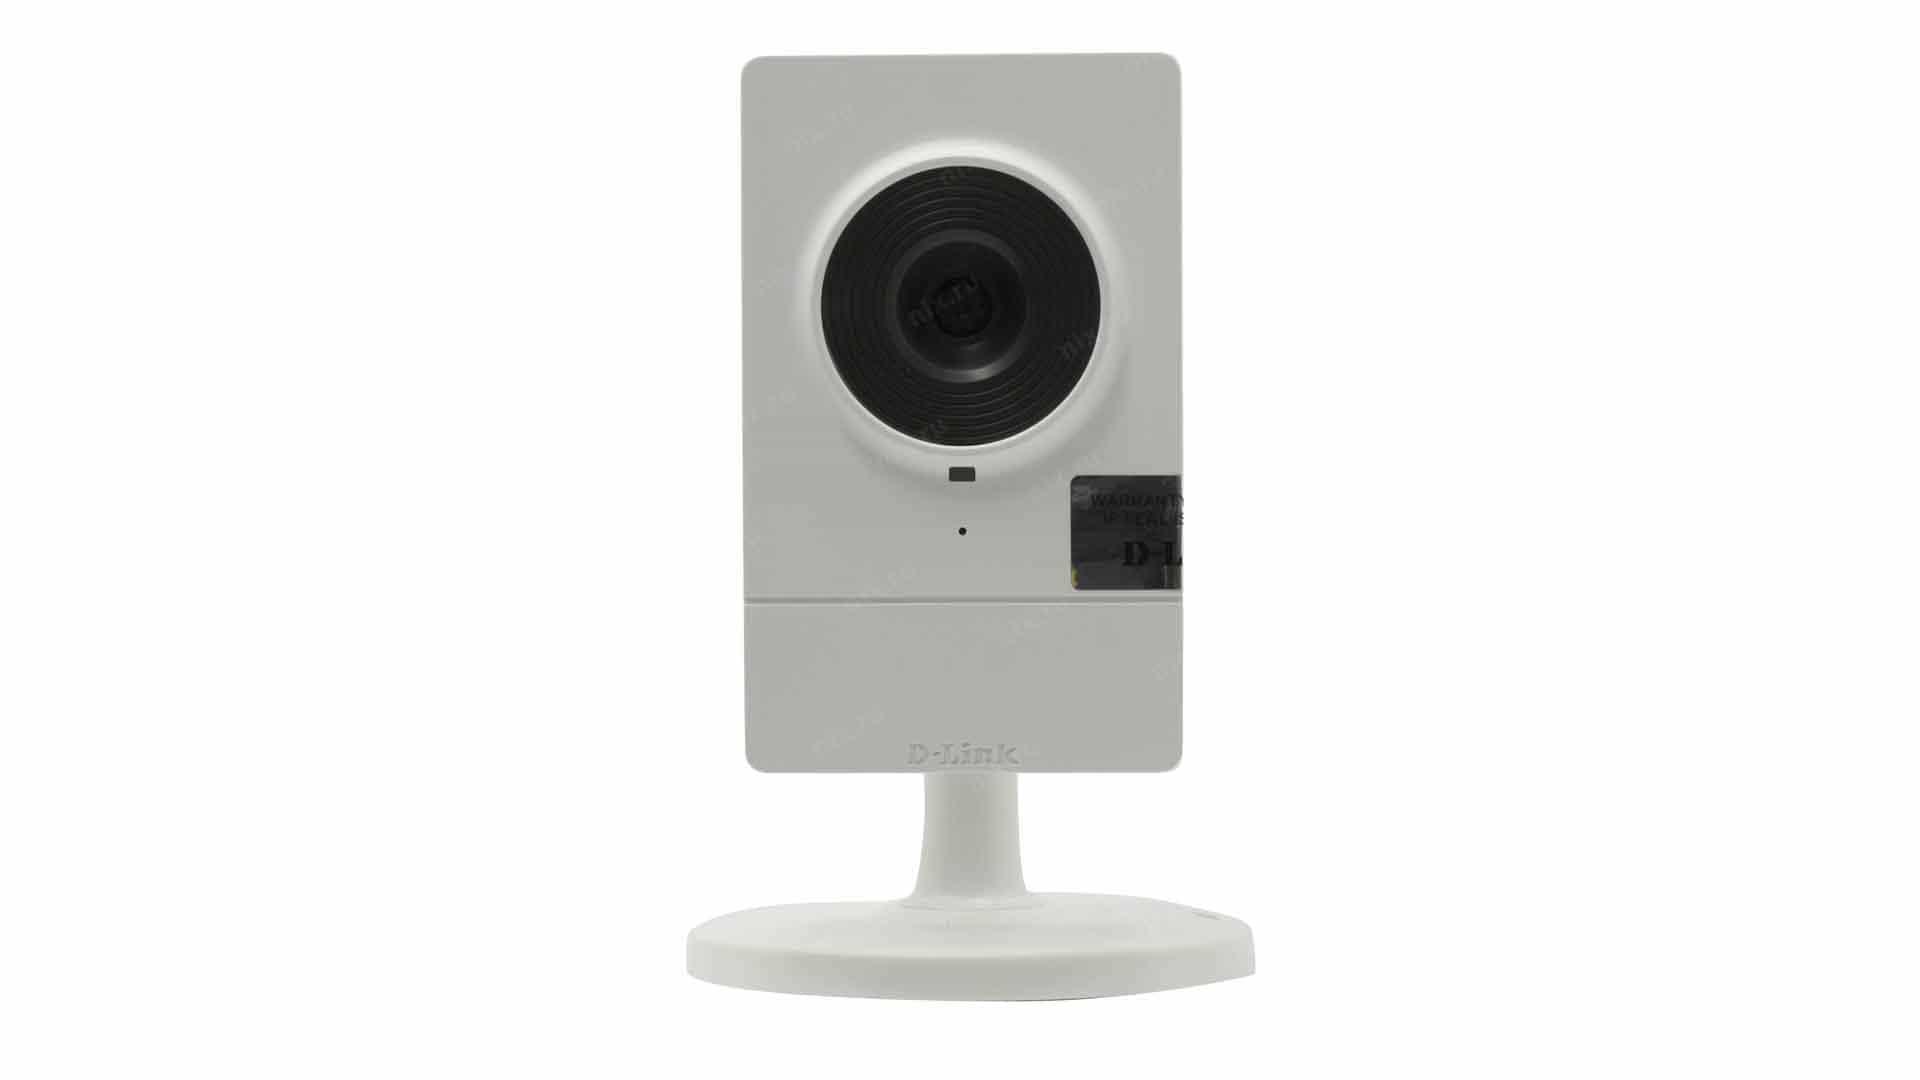 D-Link DCS-2103 – универсальная ip-камера